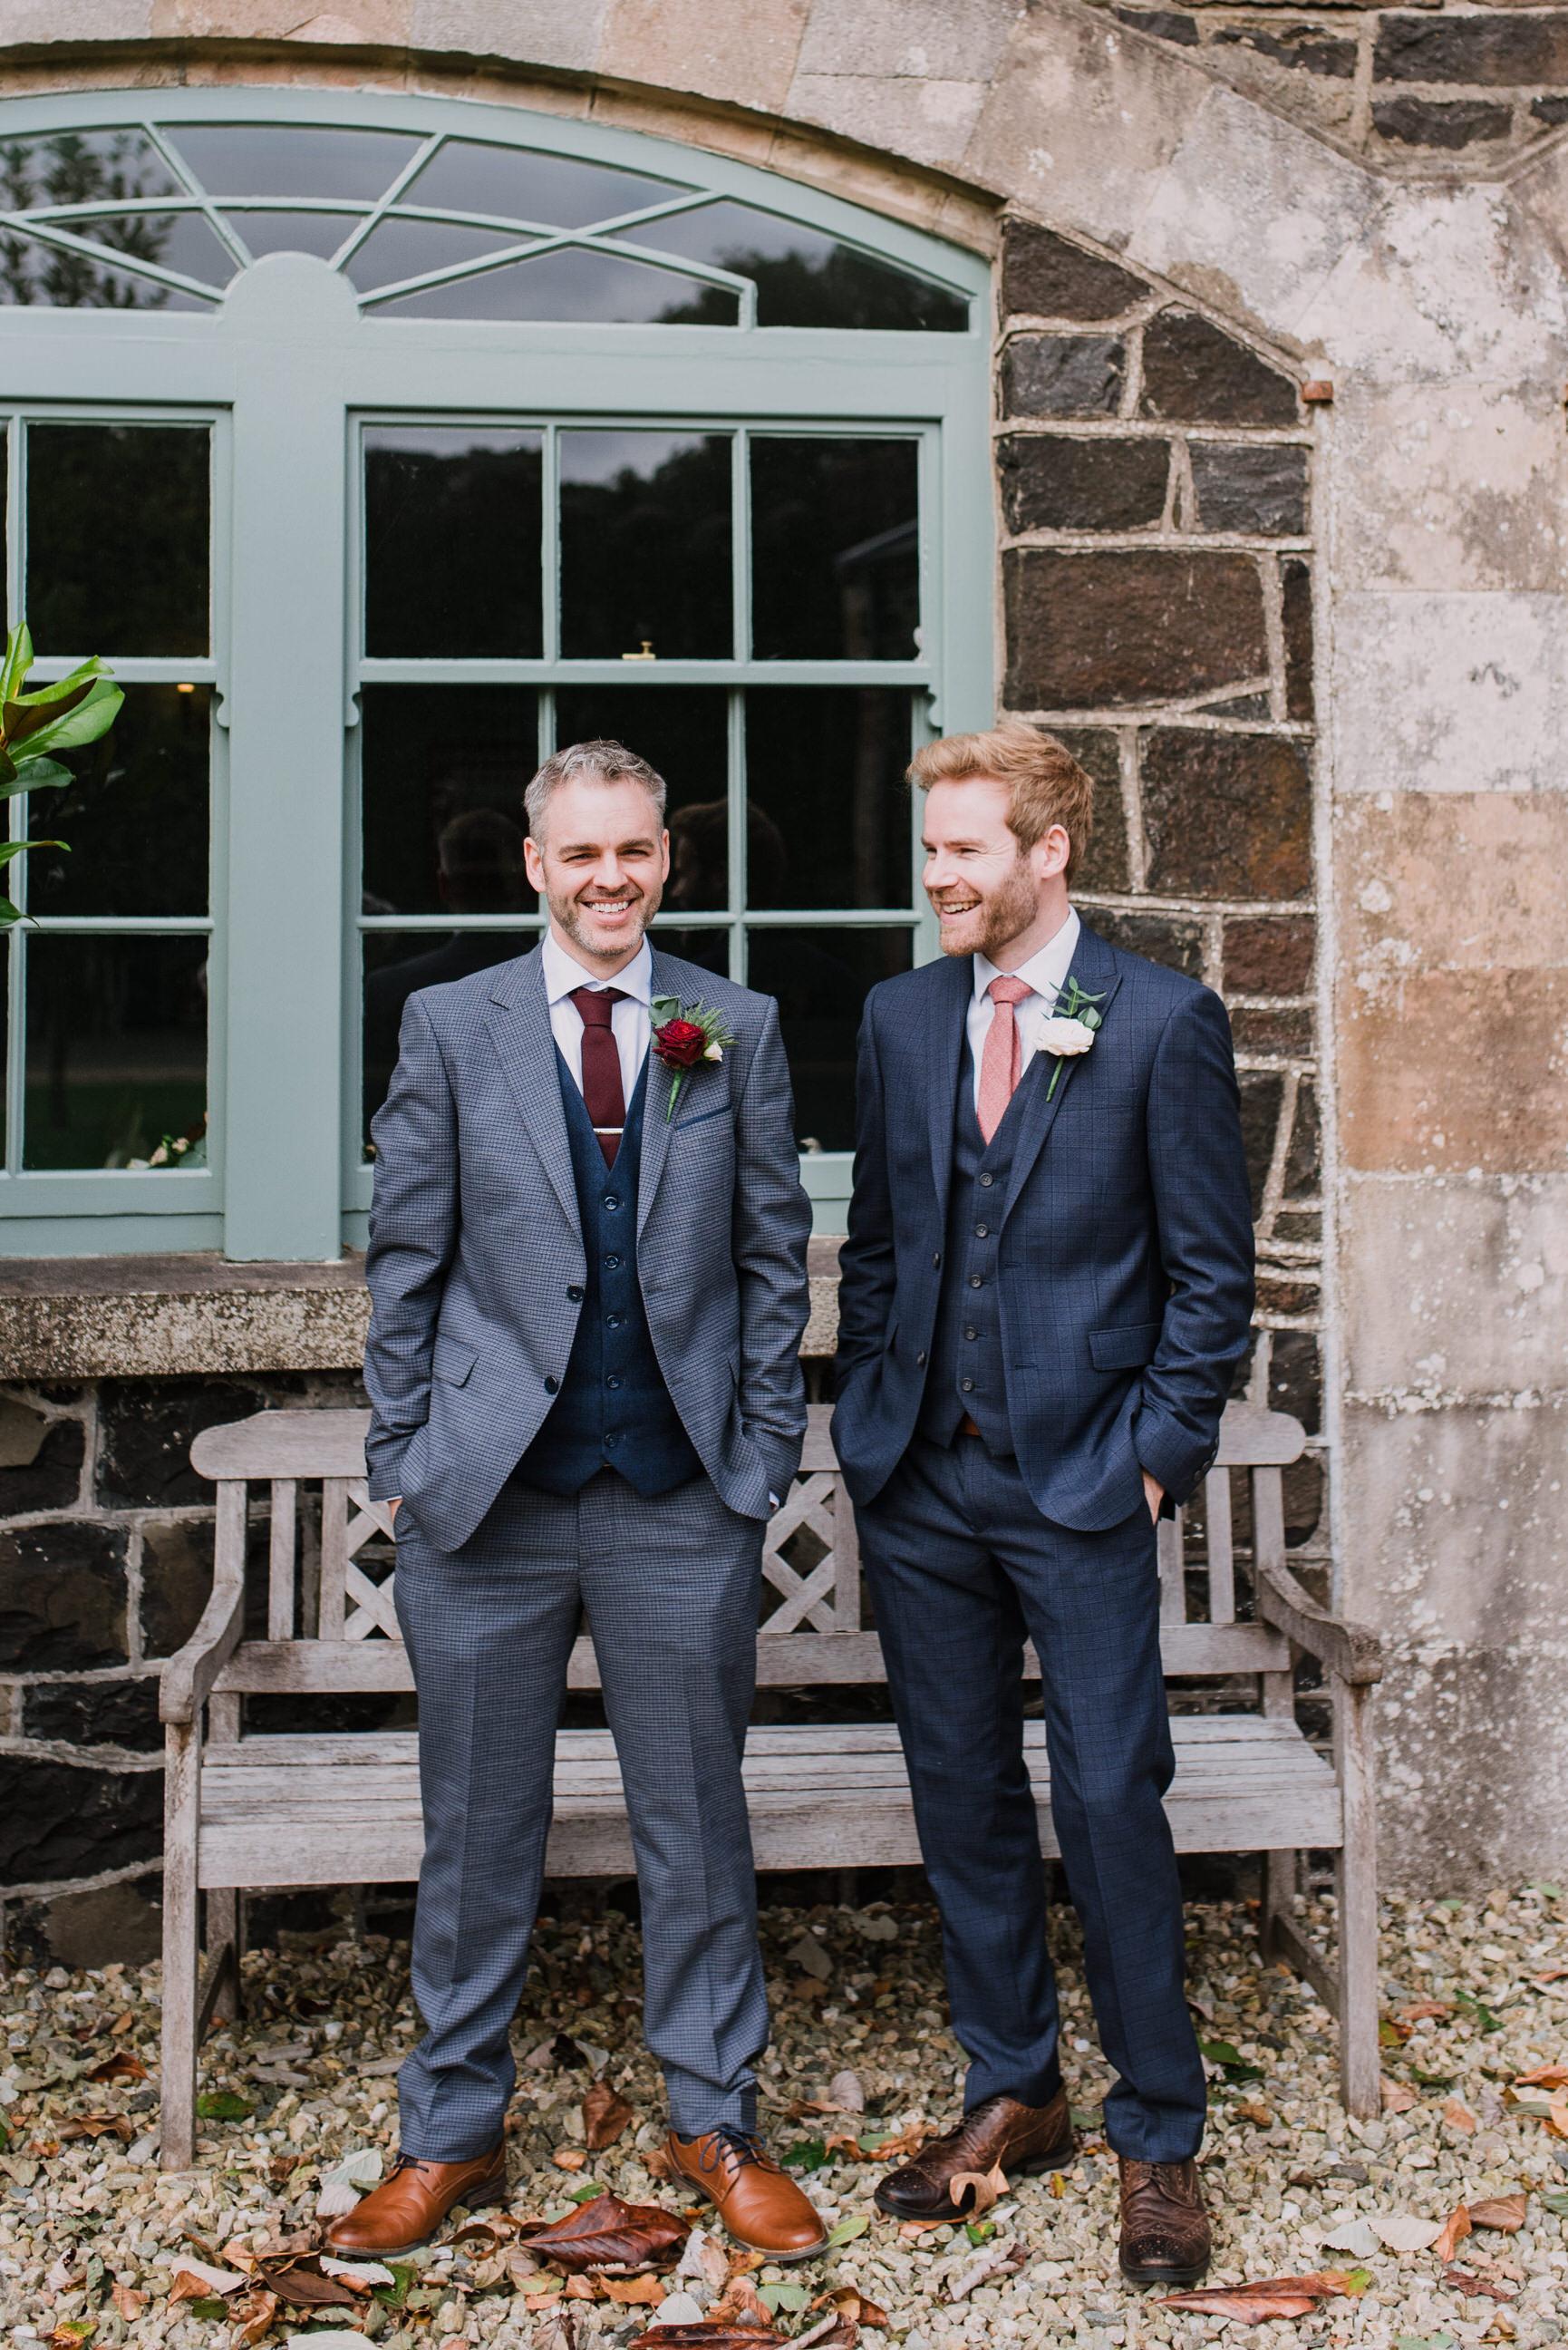 lissanoure castle wedding, northern ireland wedding photographer, romantic northern irish wedding venue, castle wedding ireland, natural wedding photography ni (23).jpg